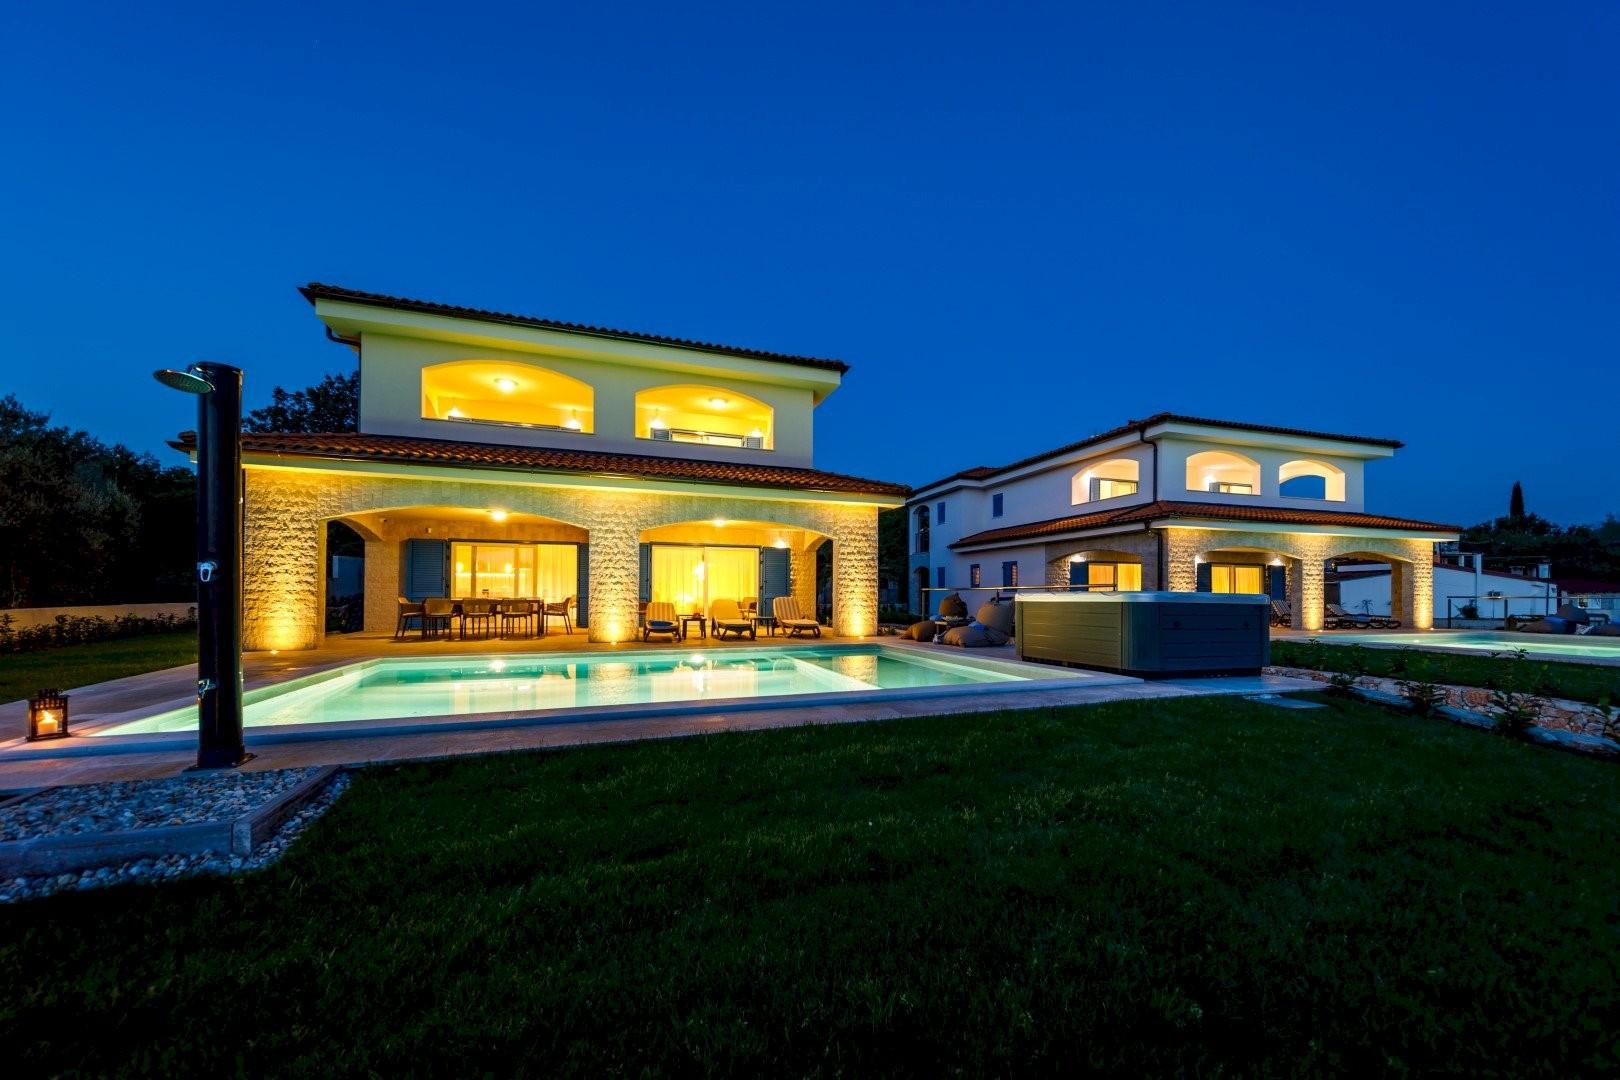 Ferienhaus Luxury Villa Loma 2 (2586643), Sveti Vid-Miholjice, Insel Krk, Kvarner, Kroatien, Bild 28